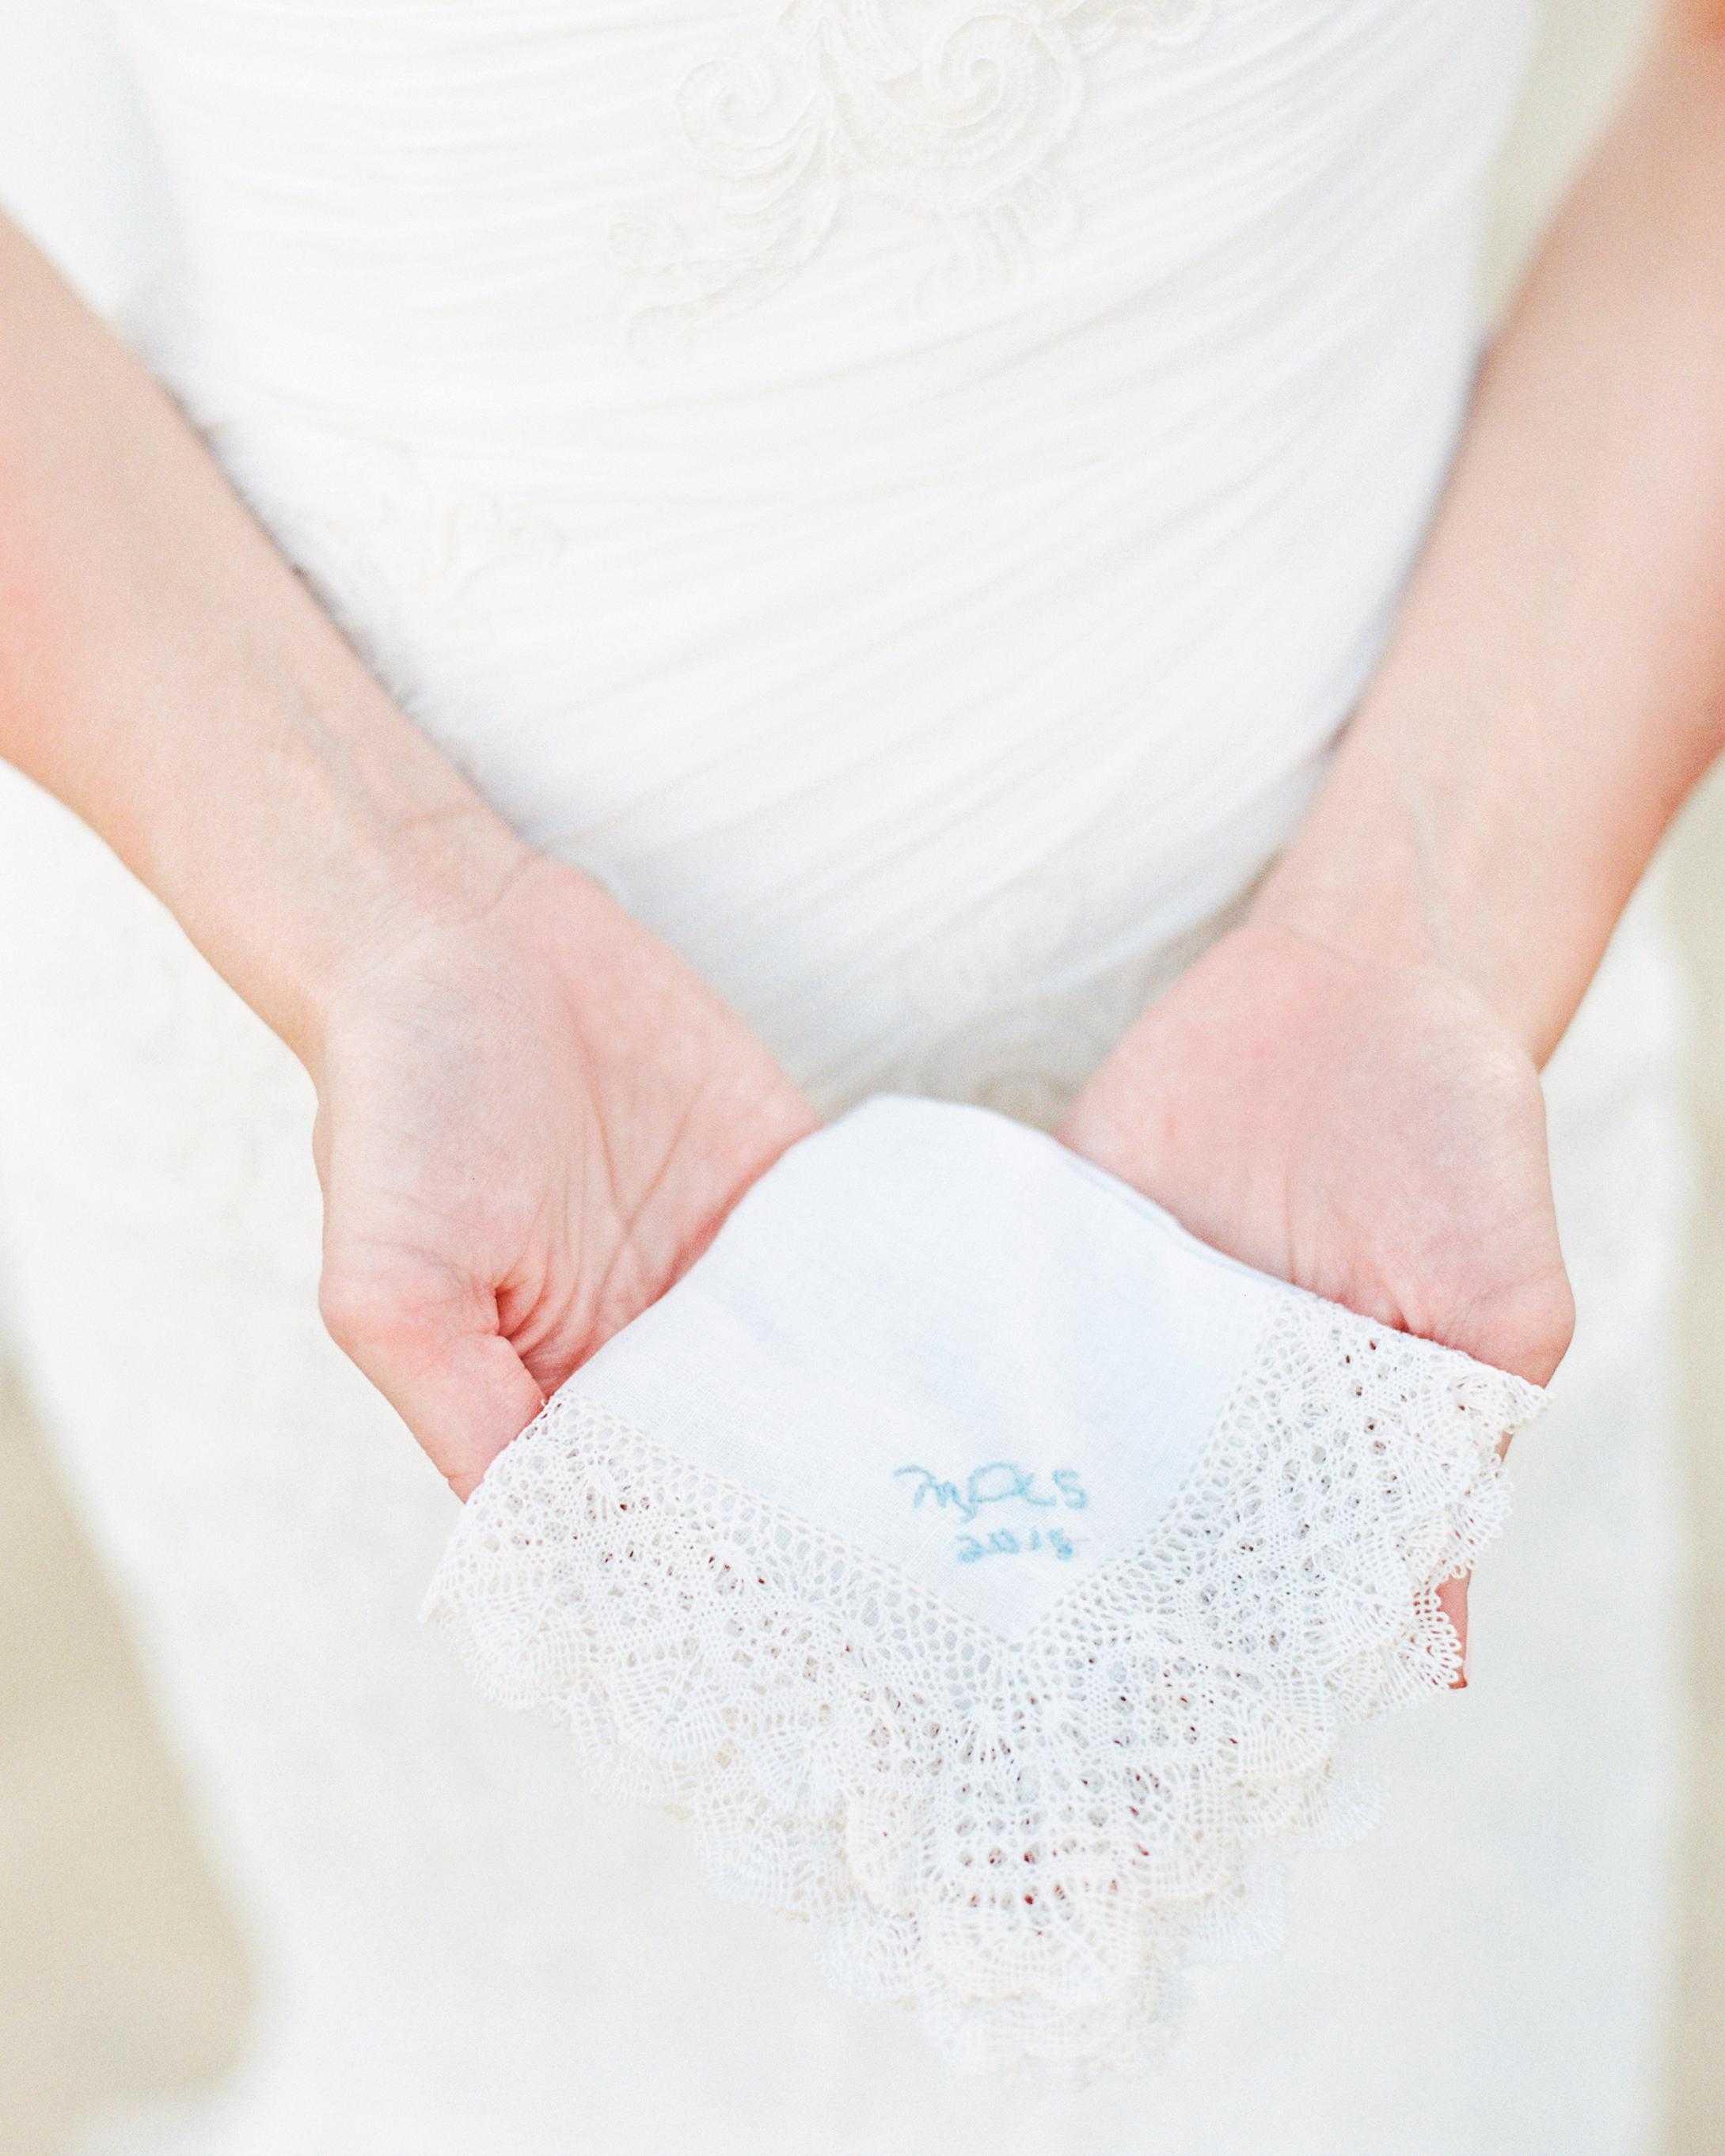 megan-jeremy-wedding-handkerchief-42-s112680-0216.jpg